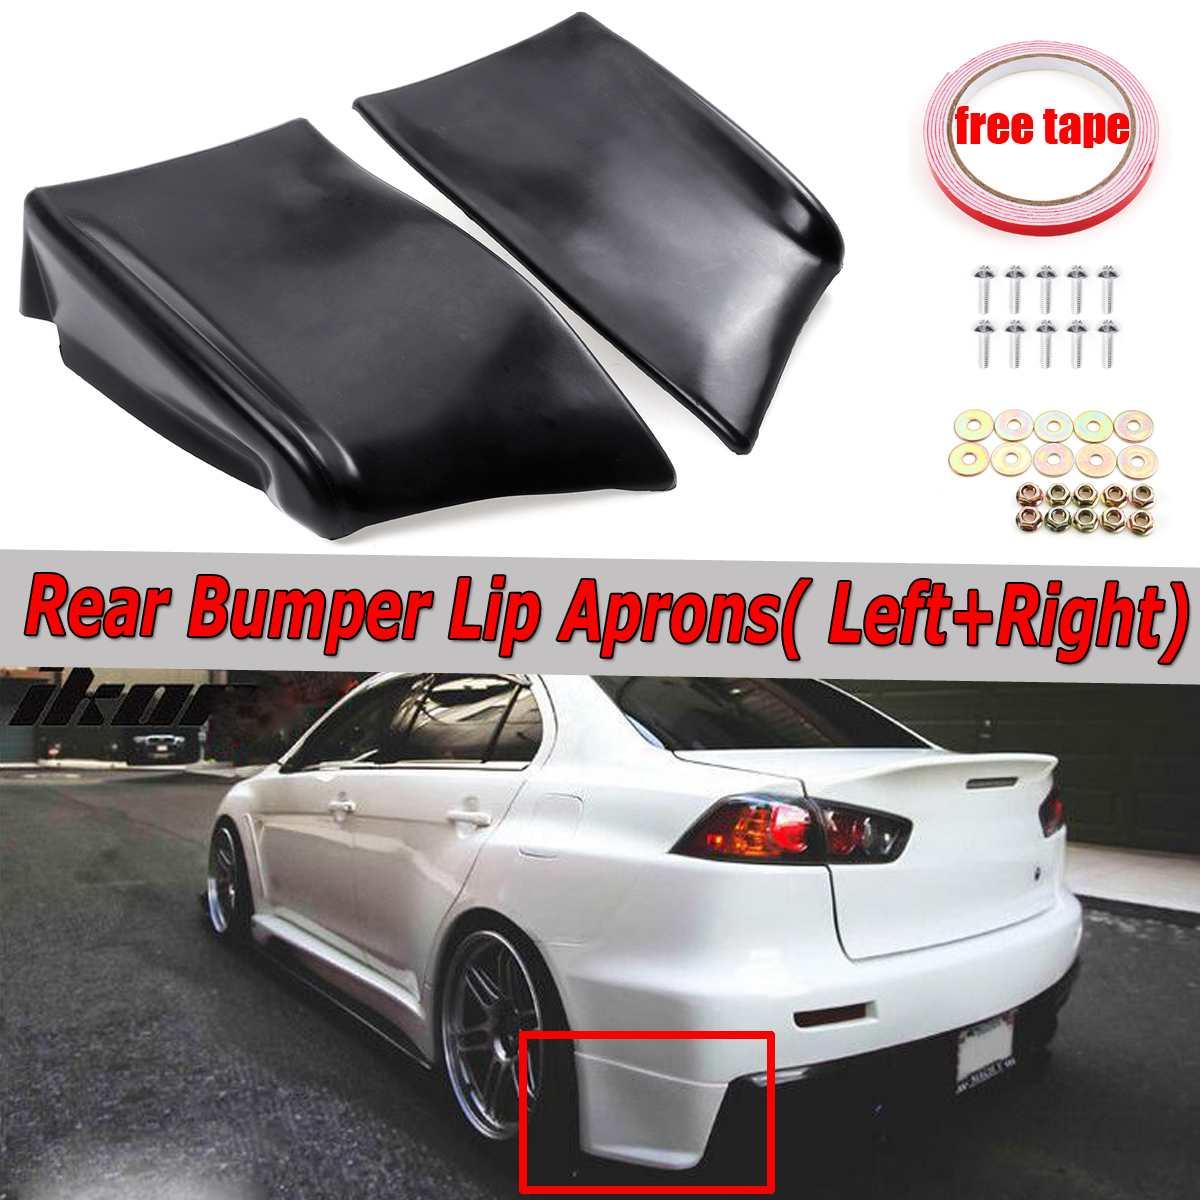 Bumper Cover For 2008-17 Mitsubishi Lancer DE ES GT GTS SE SEL Model Rear Primed